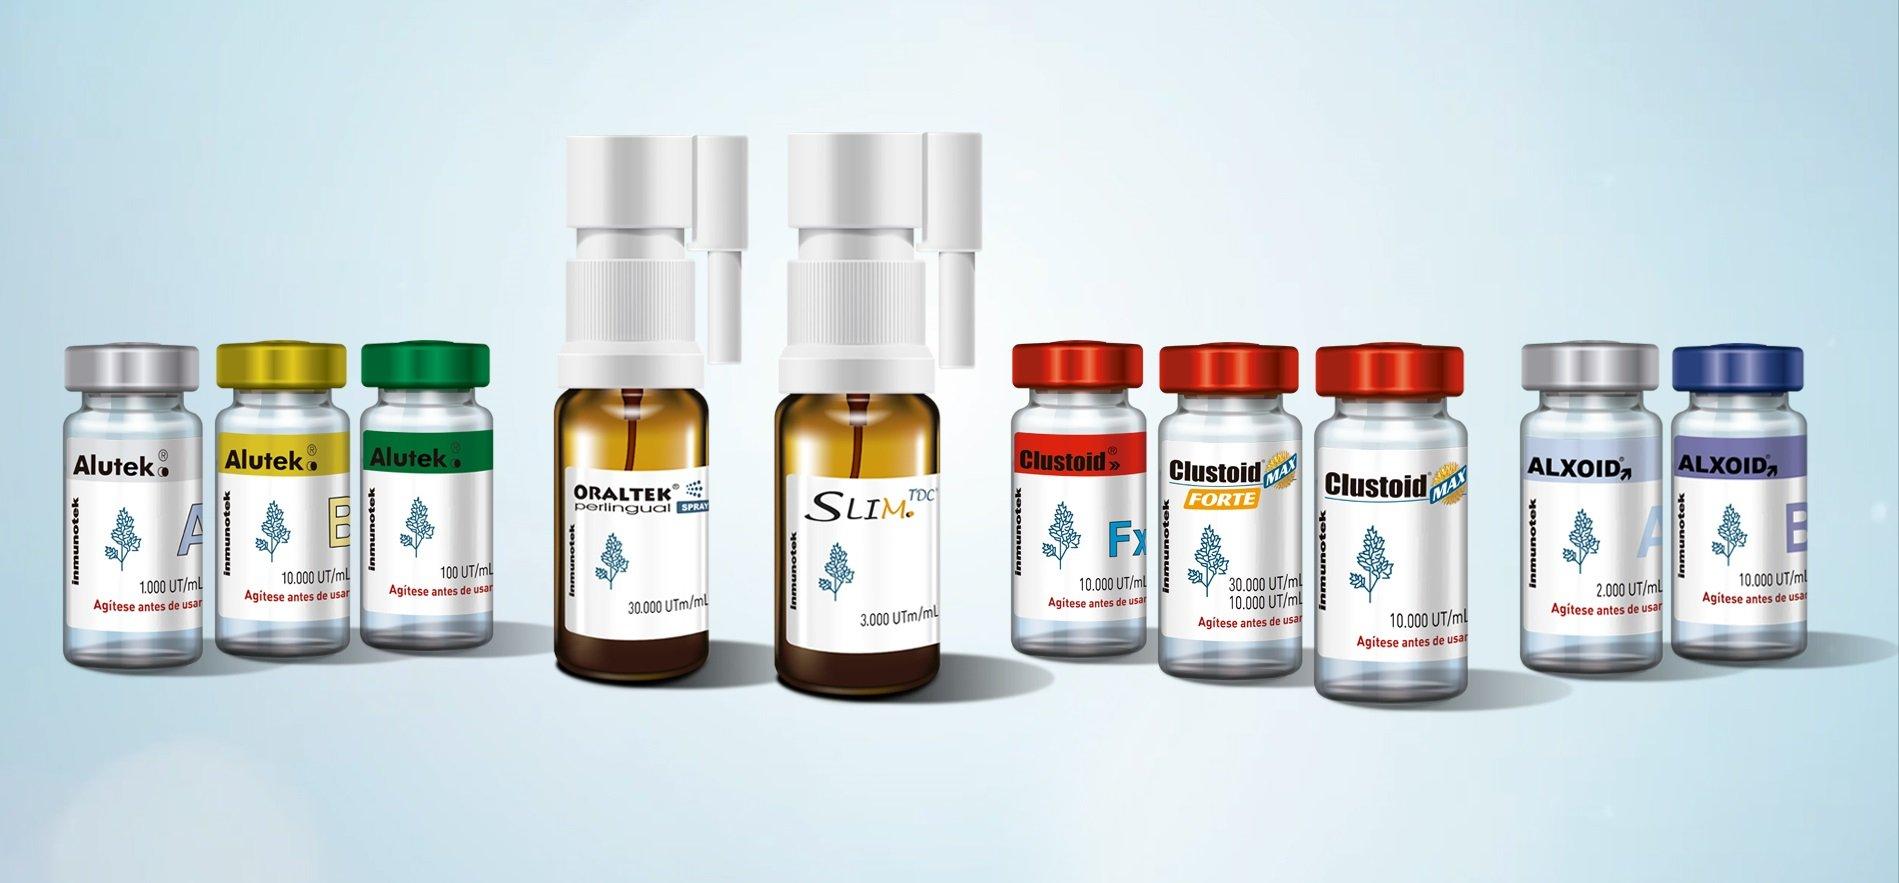 Vacunas Alergia_Inmunotek